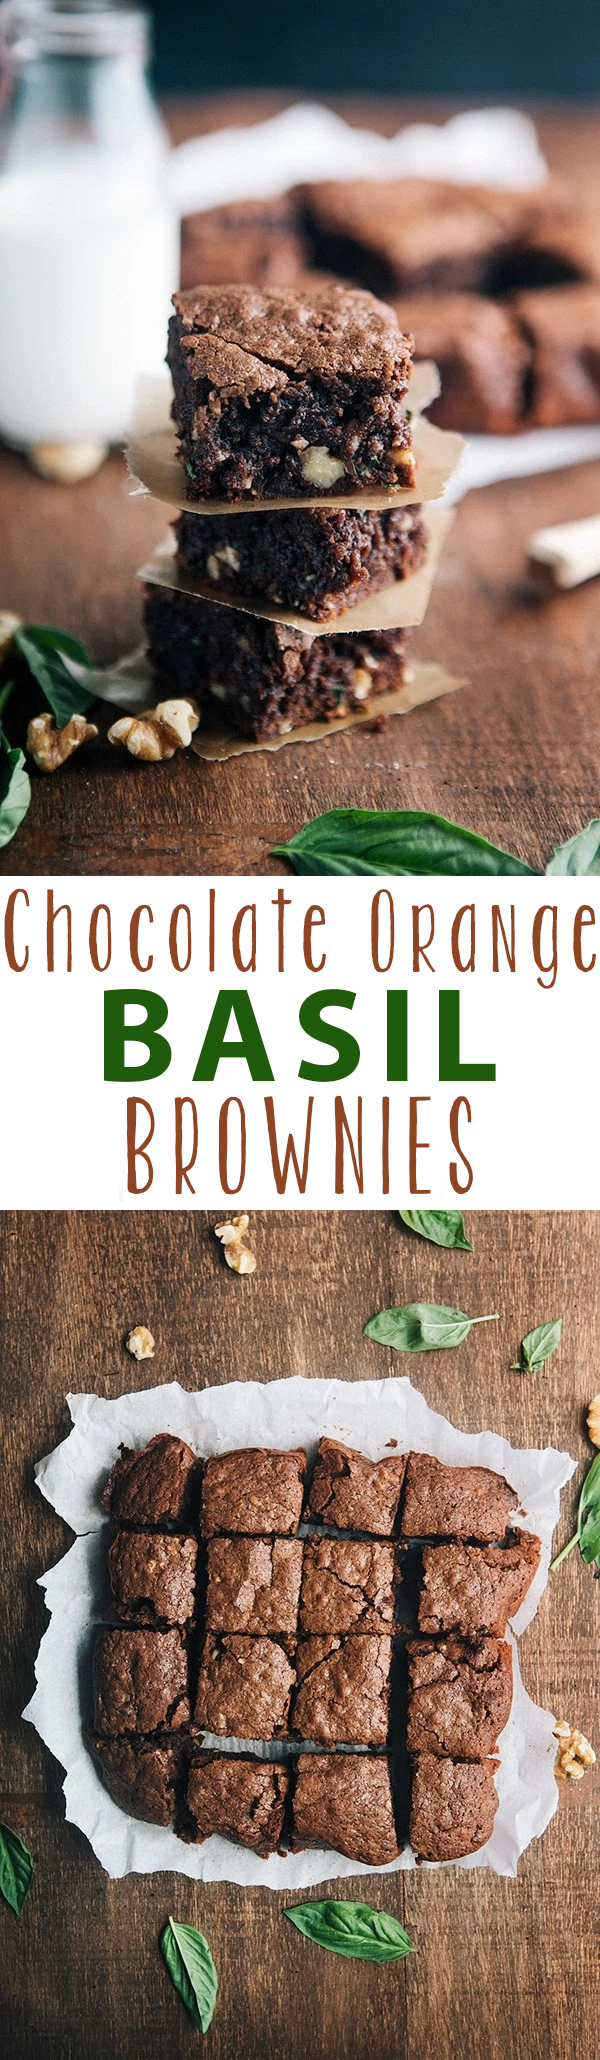 chocolate-orange-basil-brownies